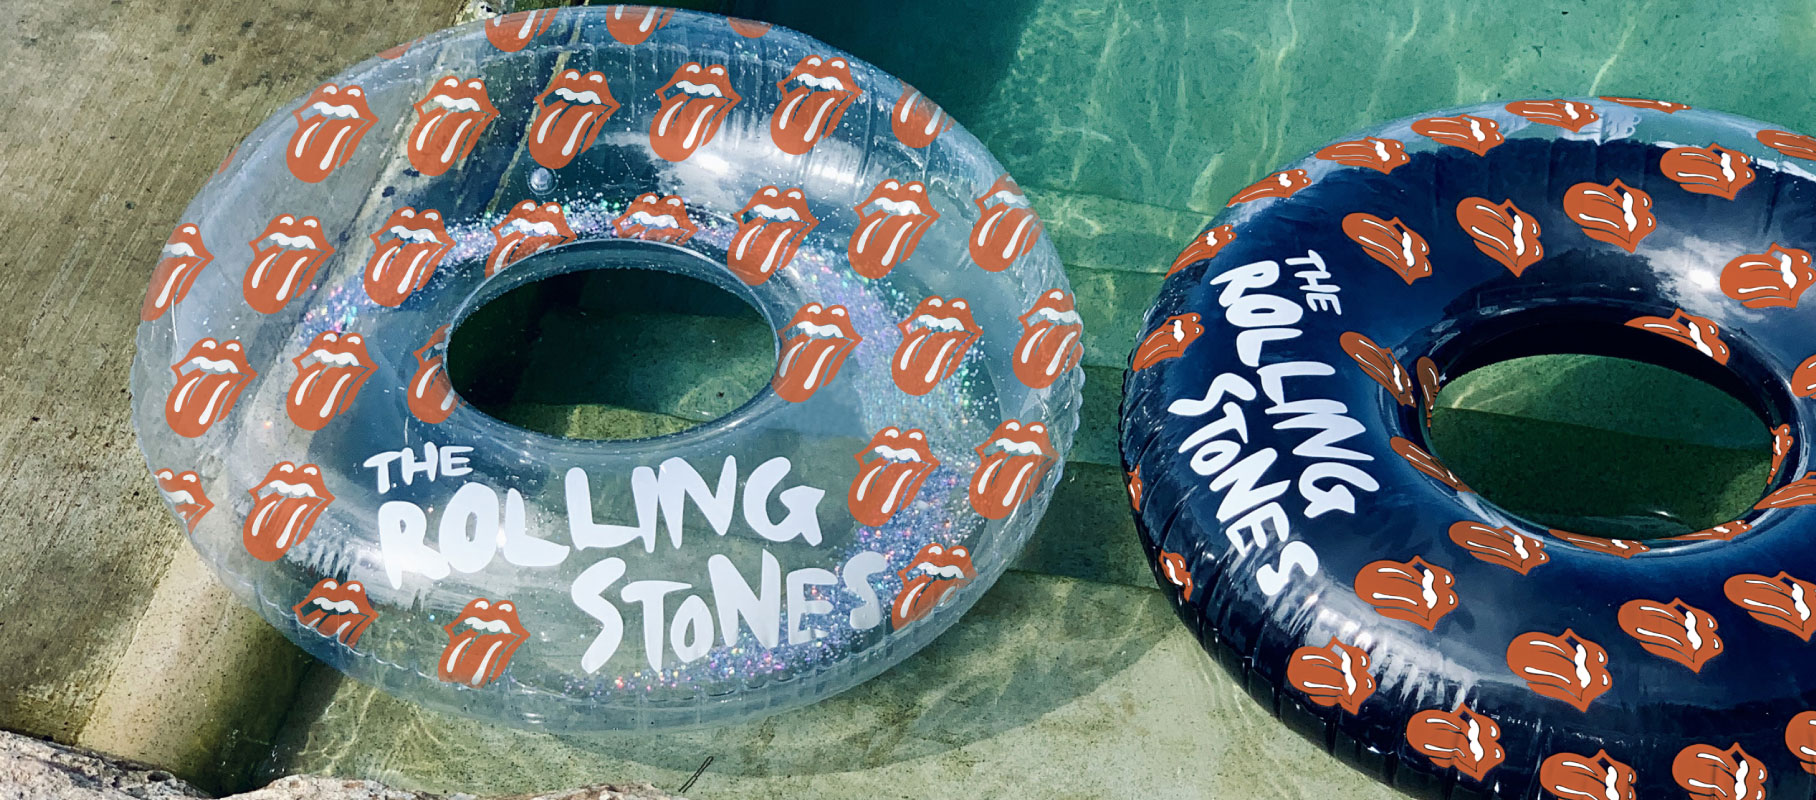 SUNNYLiFE x Rolling Stones